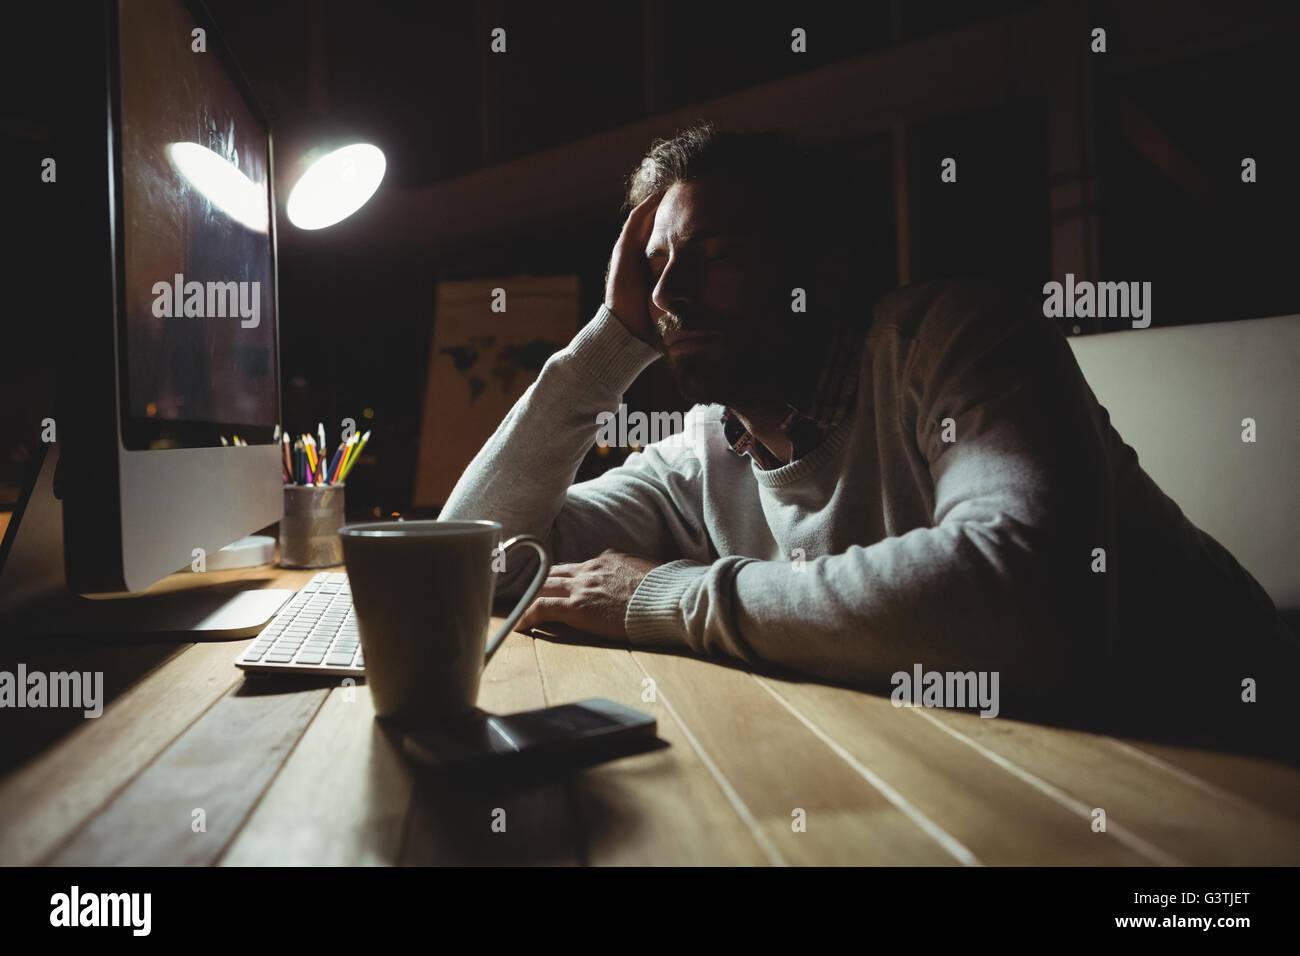 Sleepy businessman watching his computer - Stock Image